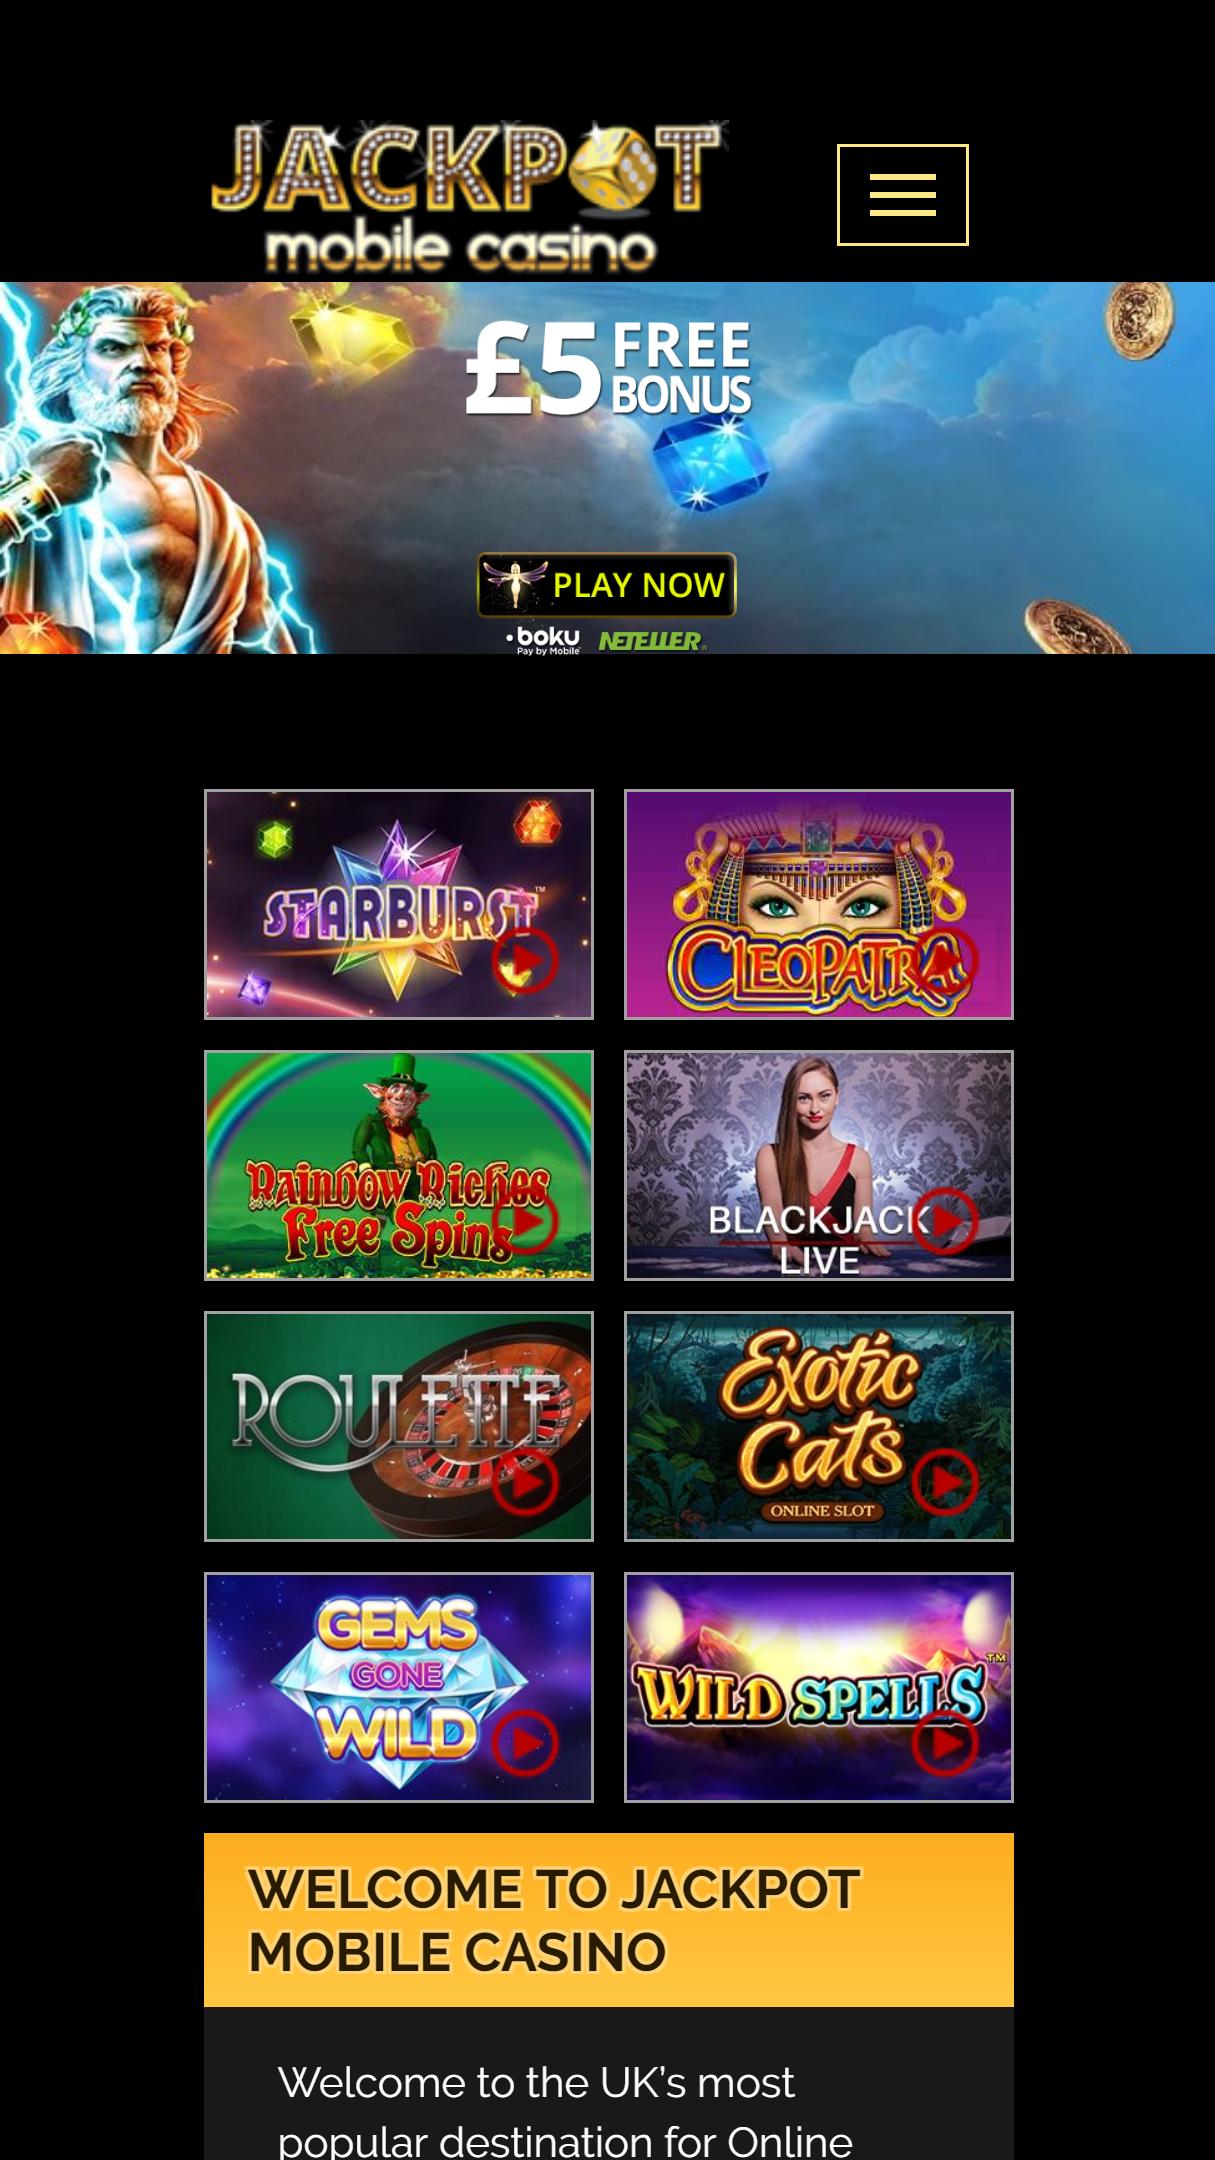 Jackpot Mobile Casino App Homepage